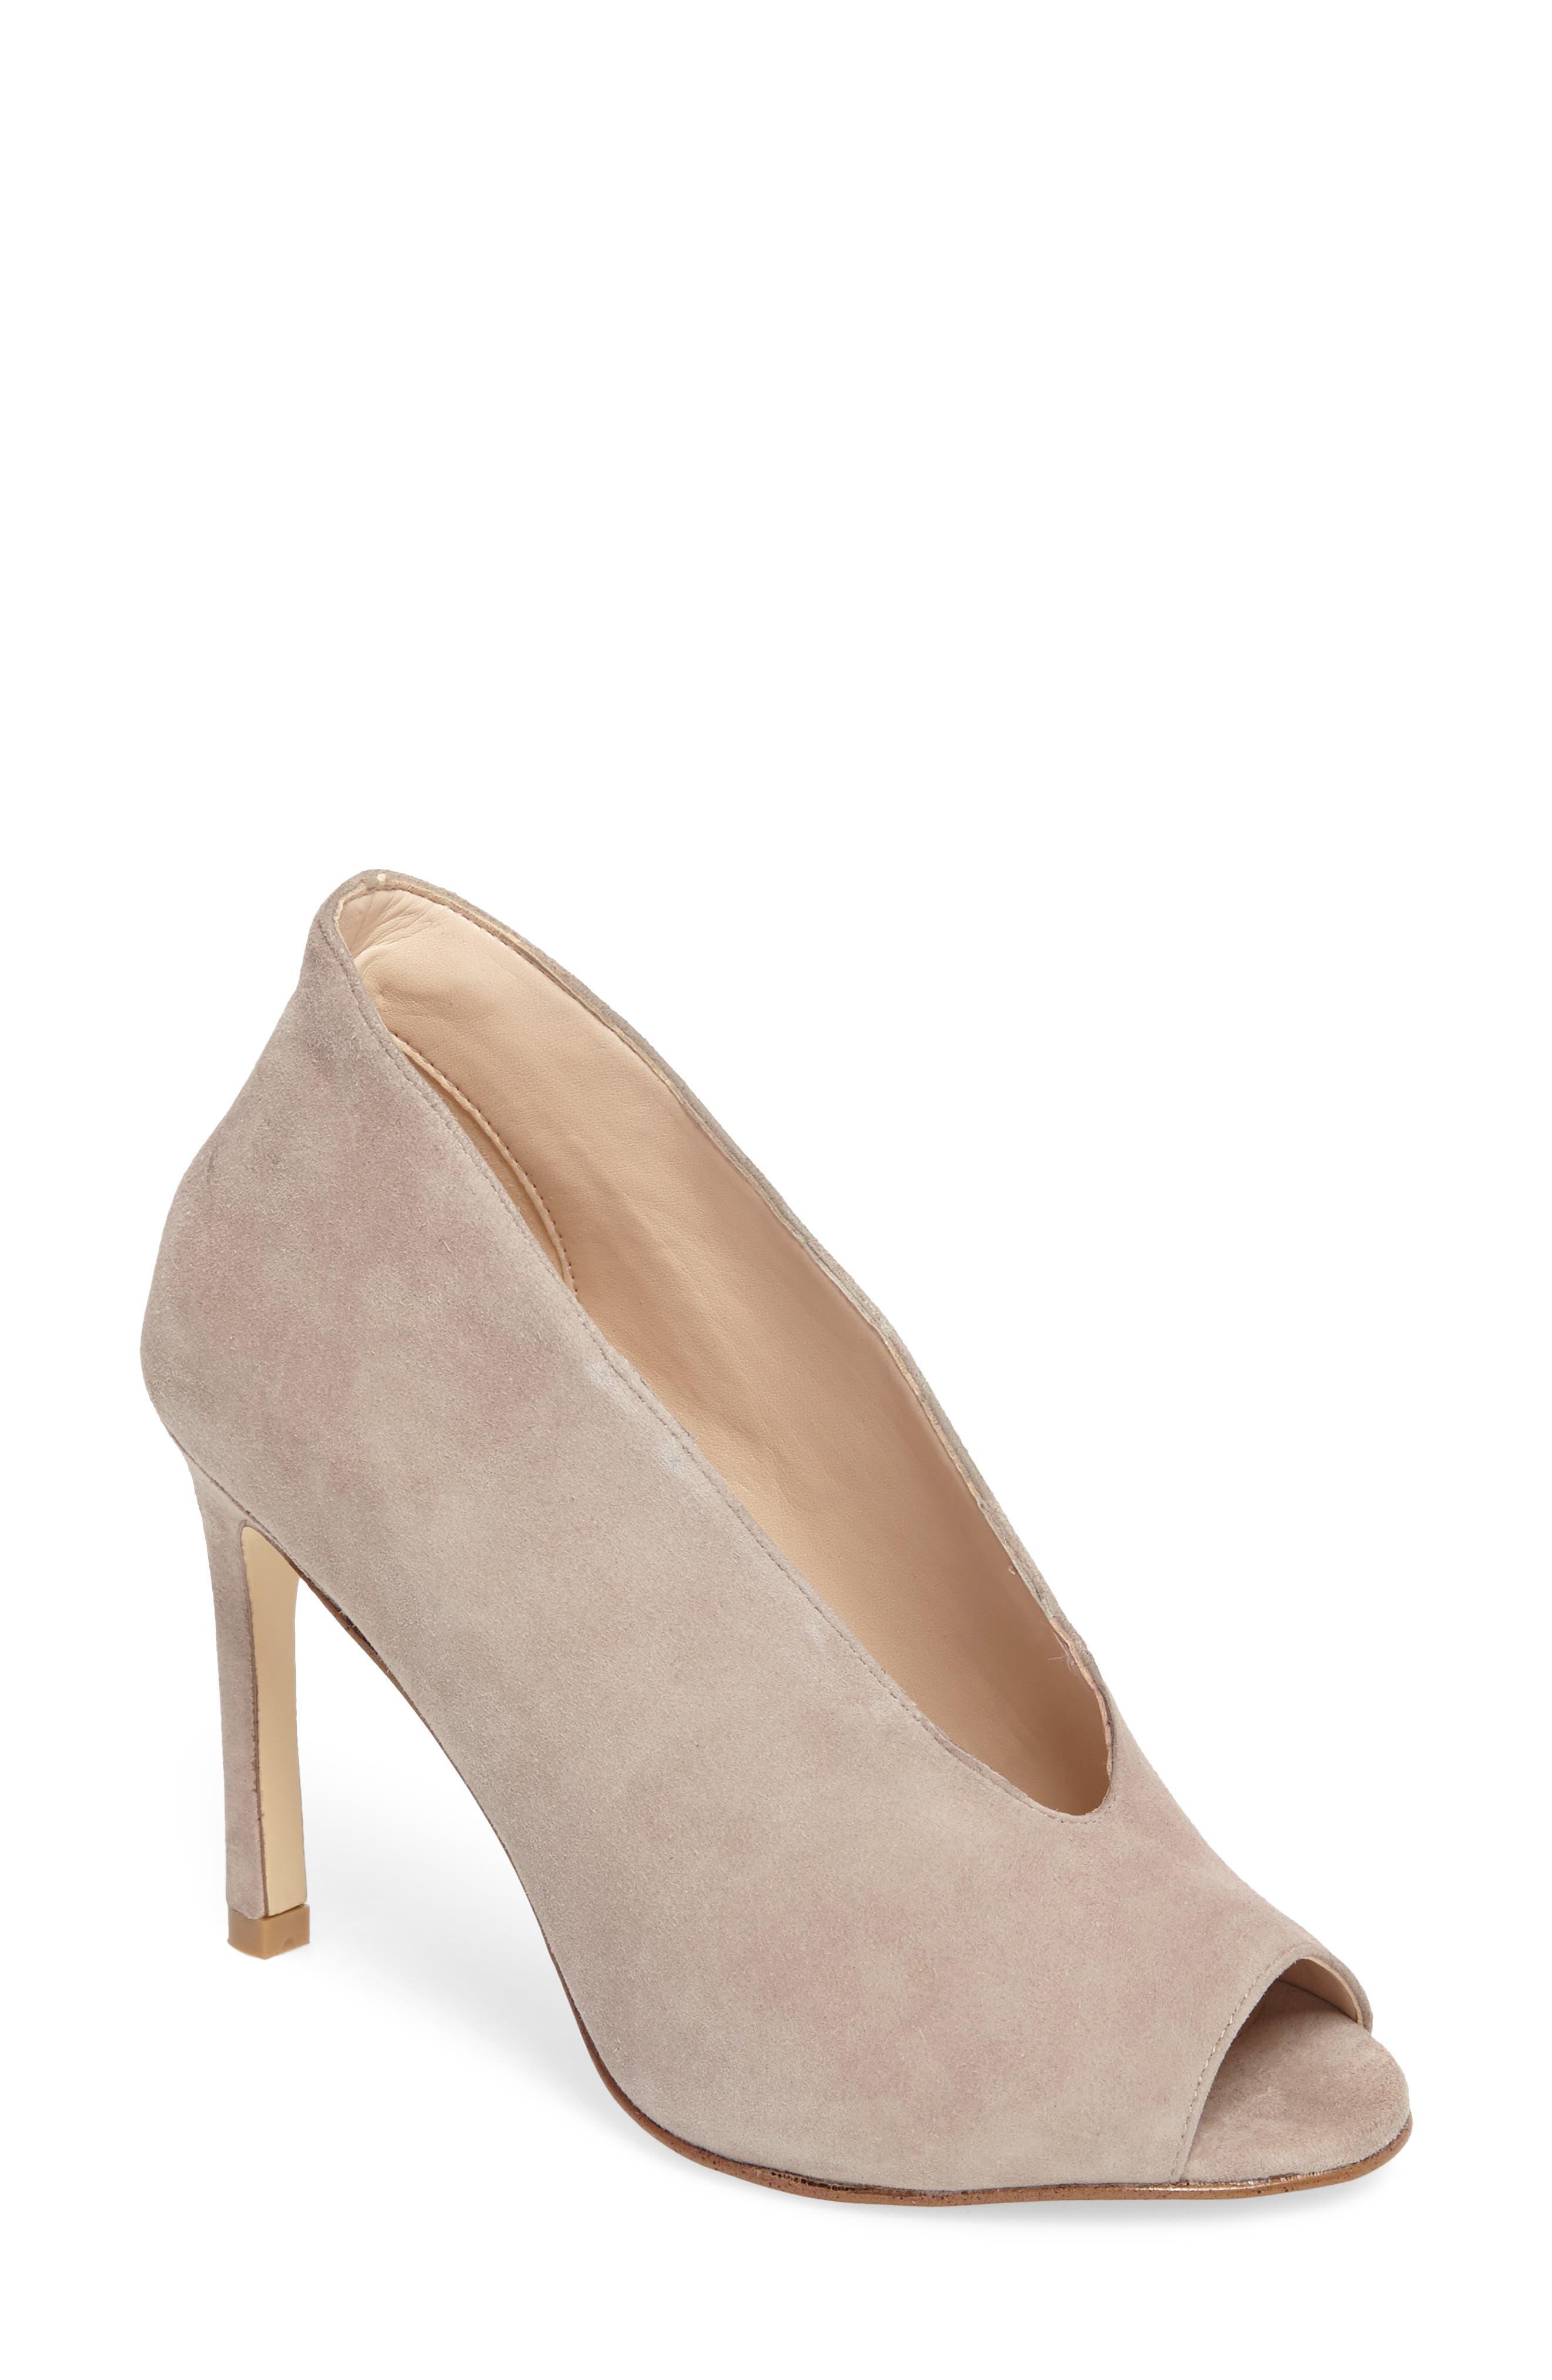 Alternate Image 1 Selected - Pelle Moda Elvia Peep Toe Pump (Women)